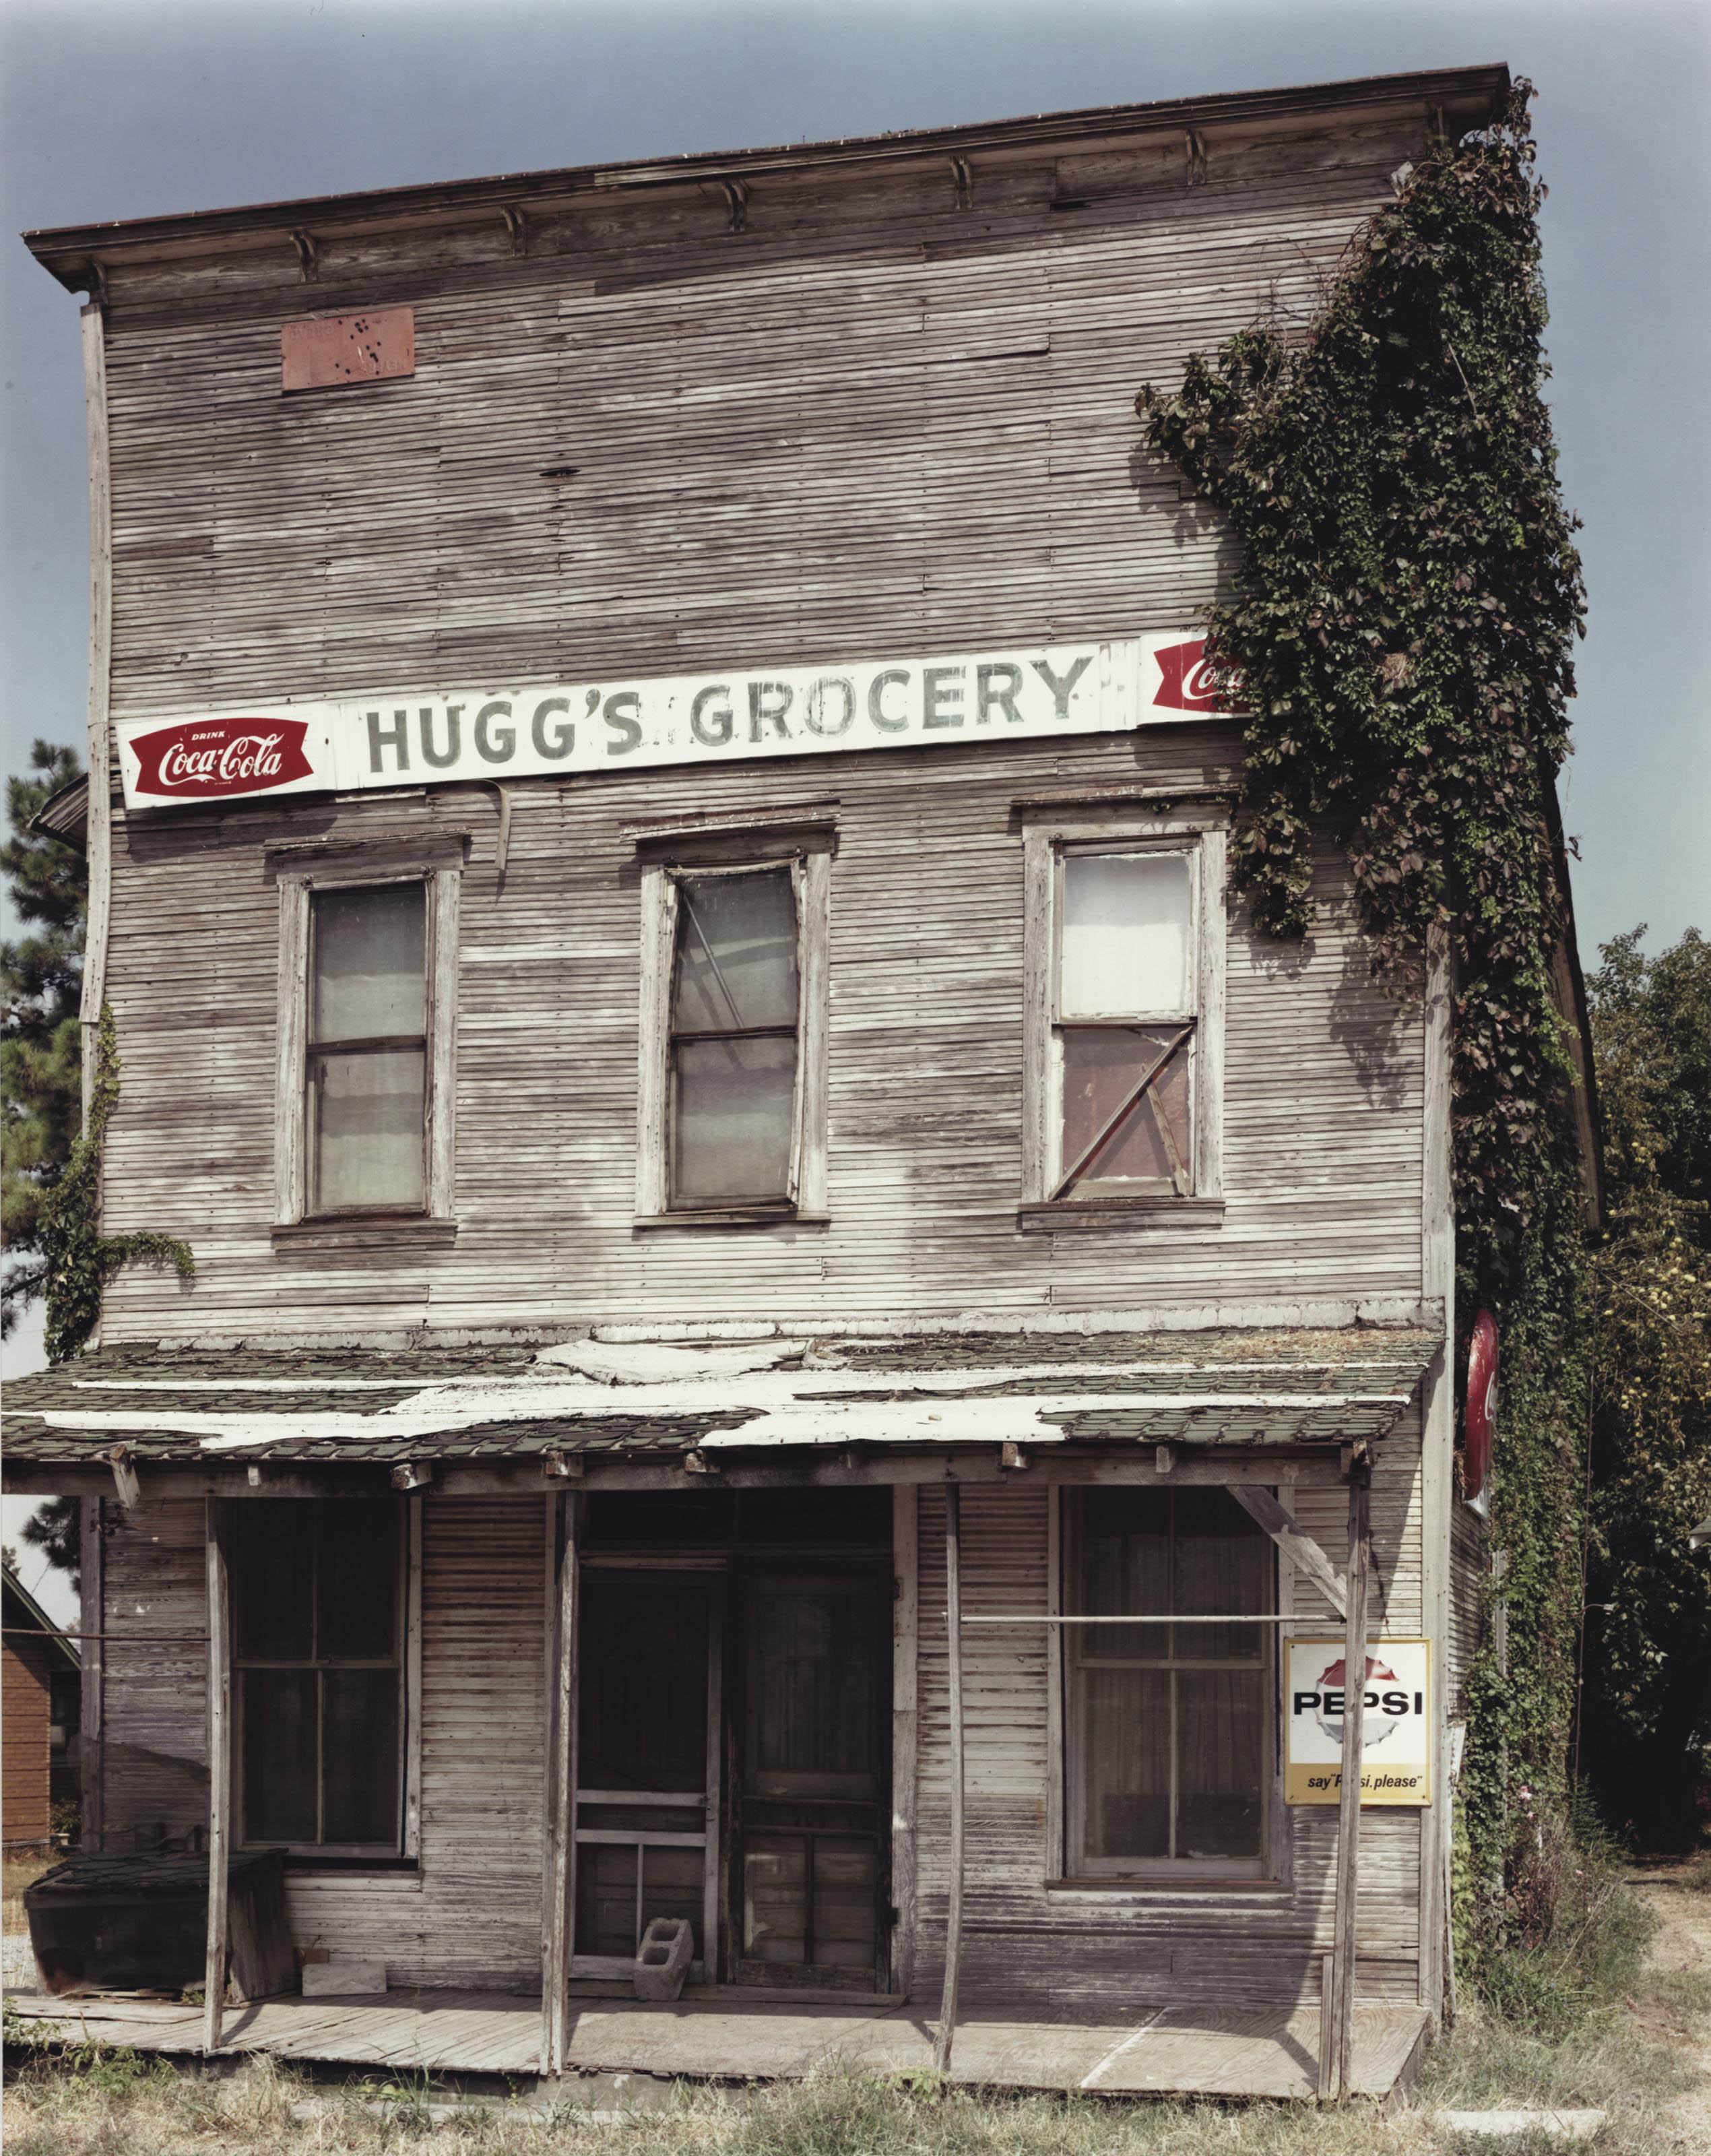 Huggs Grocery, Ulm; and Post Office, Columbus, Arkansas, 1982